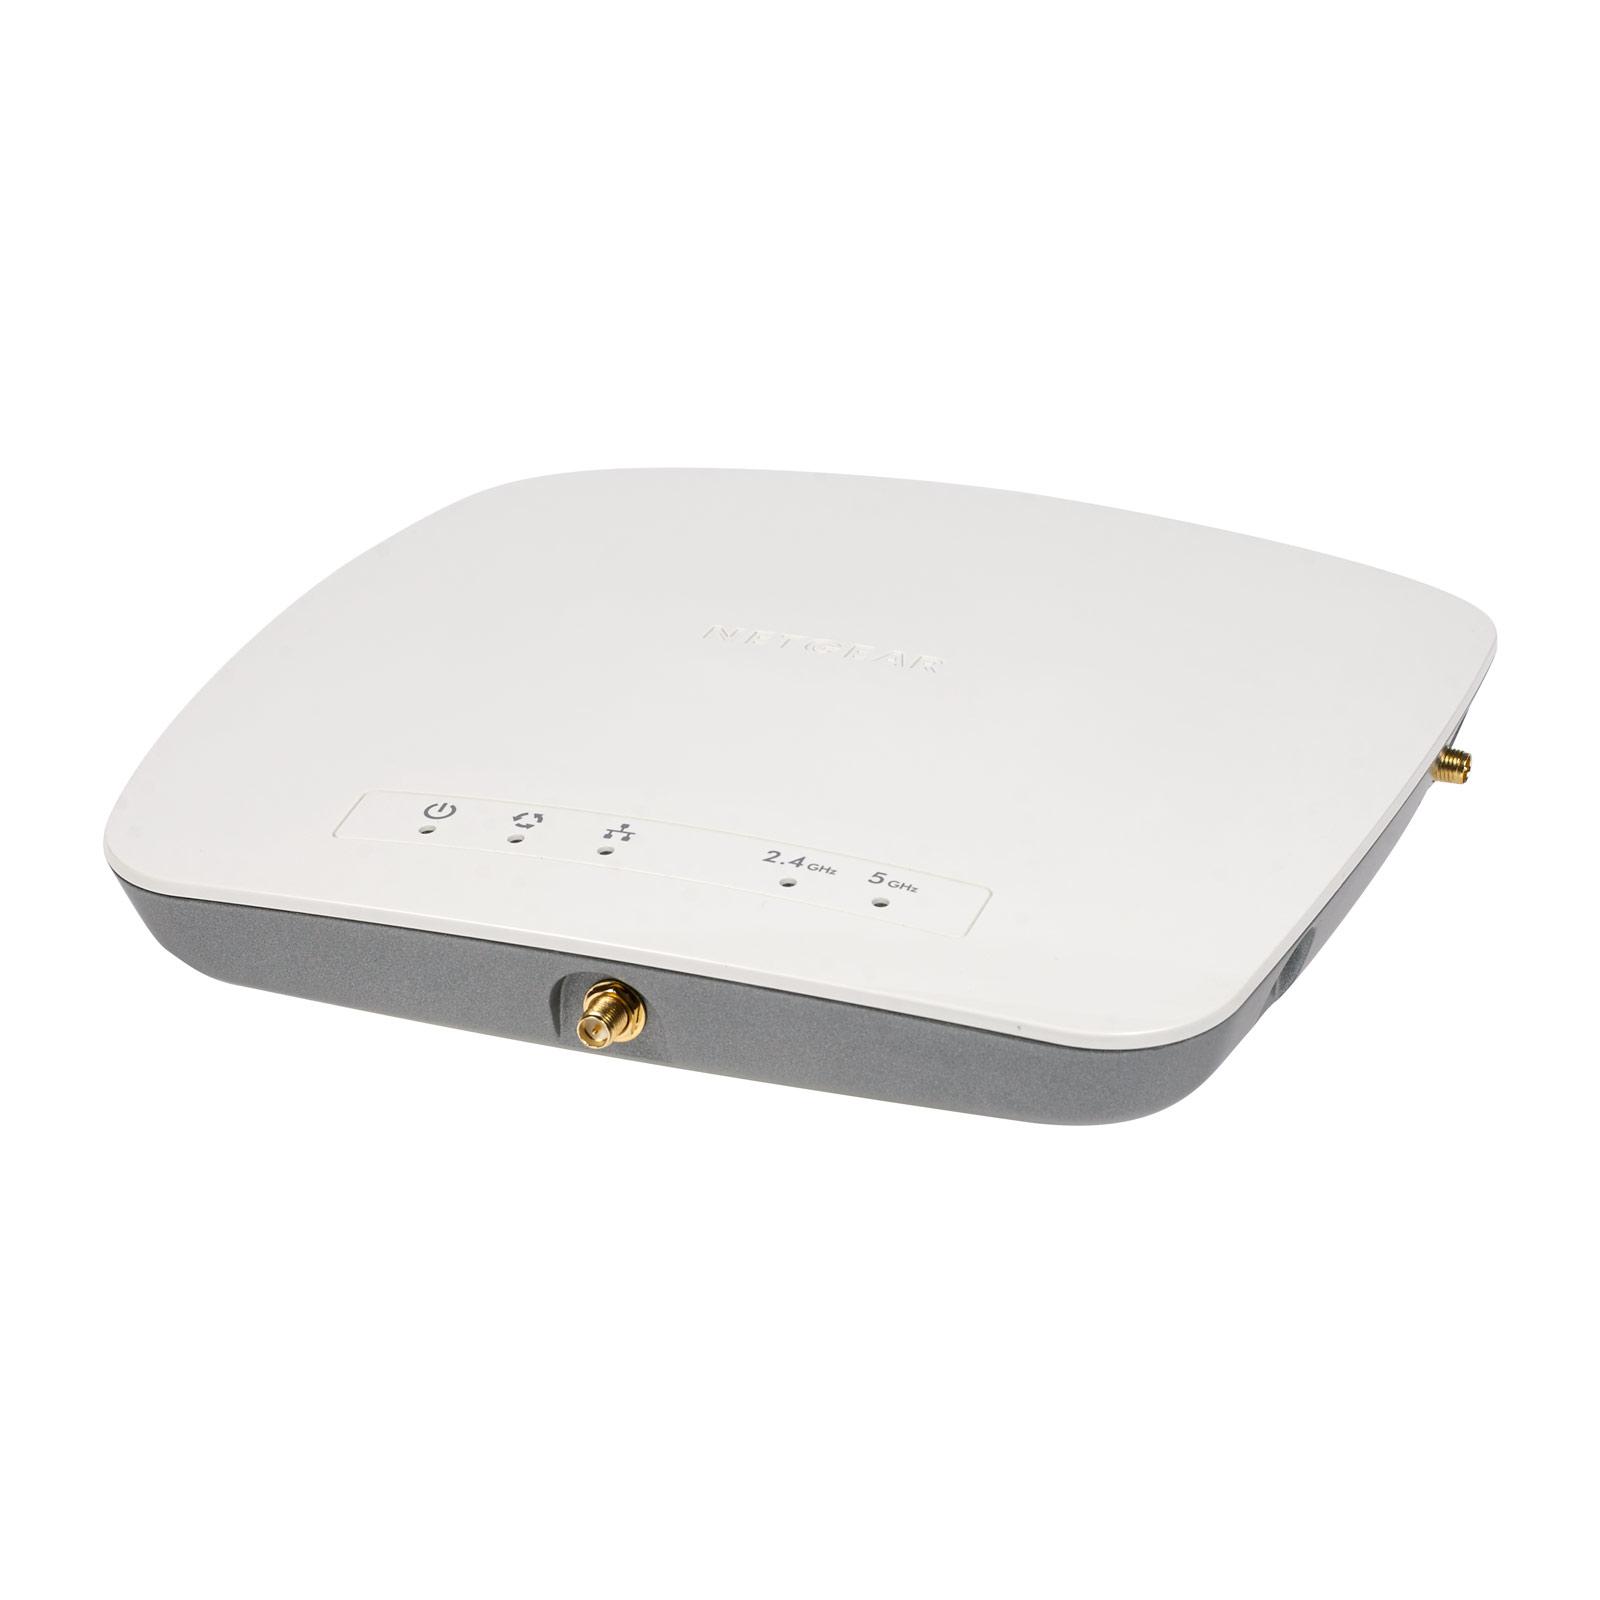 borne wifi netgear